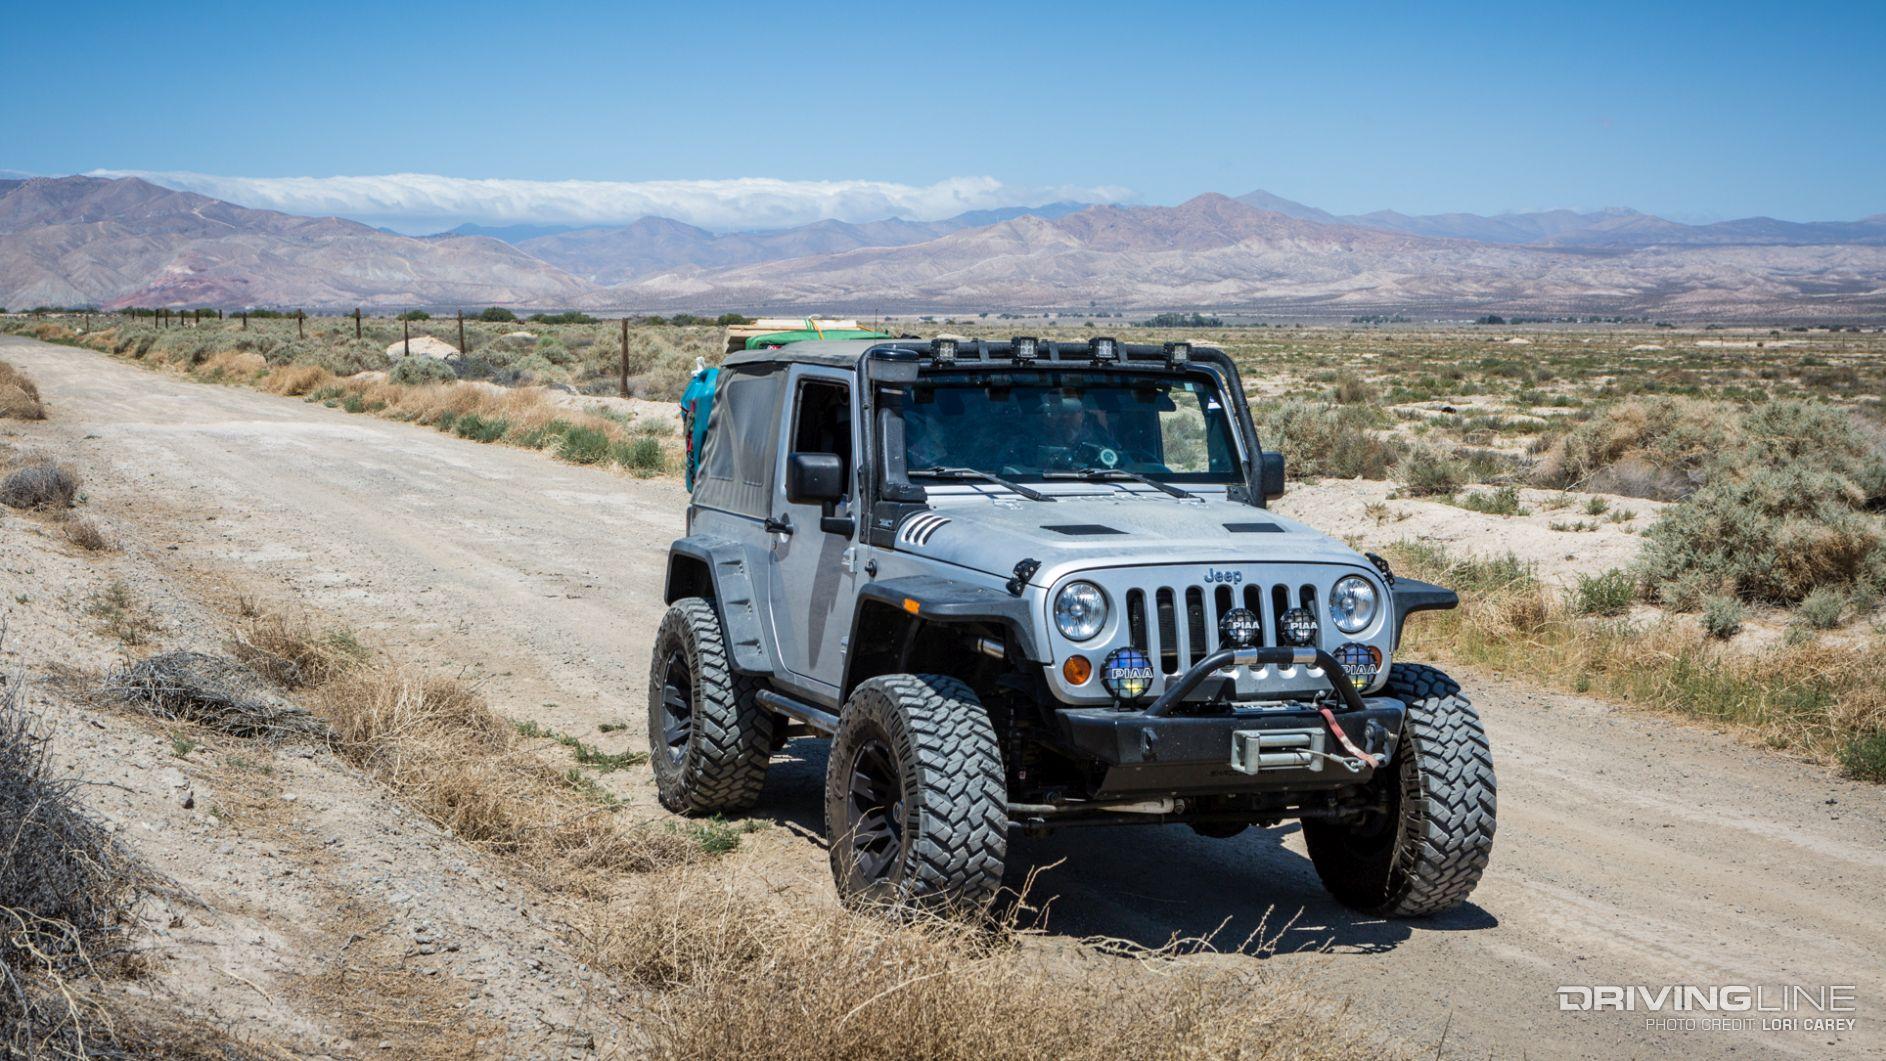 koehn lake trail review in a jeep wrangler jk drivingline. Black Bedroom Furniture Sets. Home Design Ideas